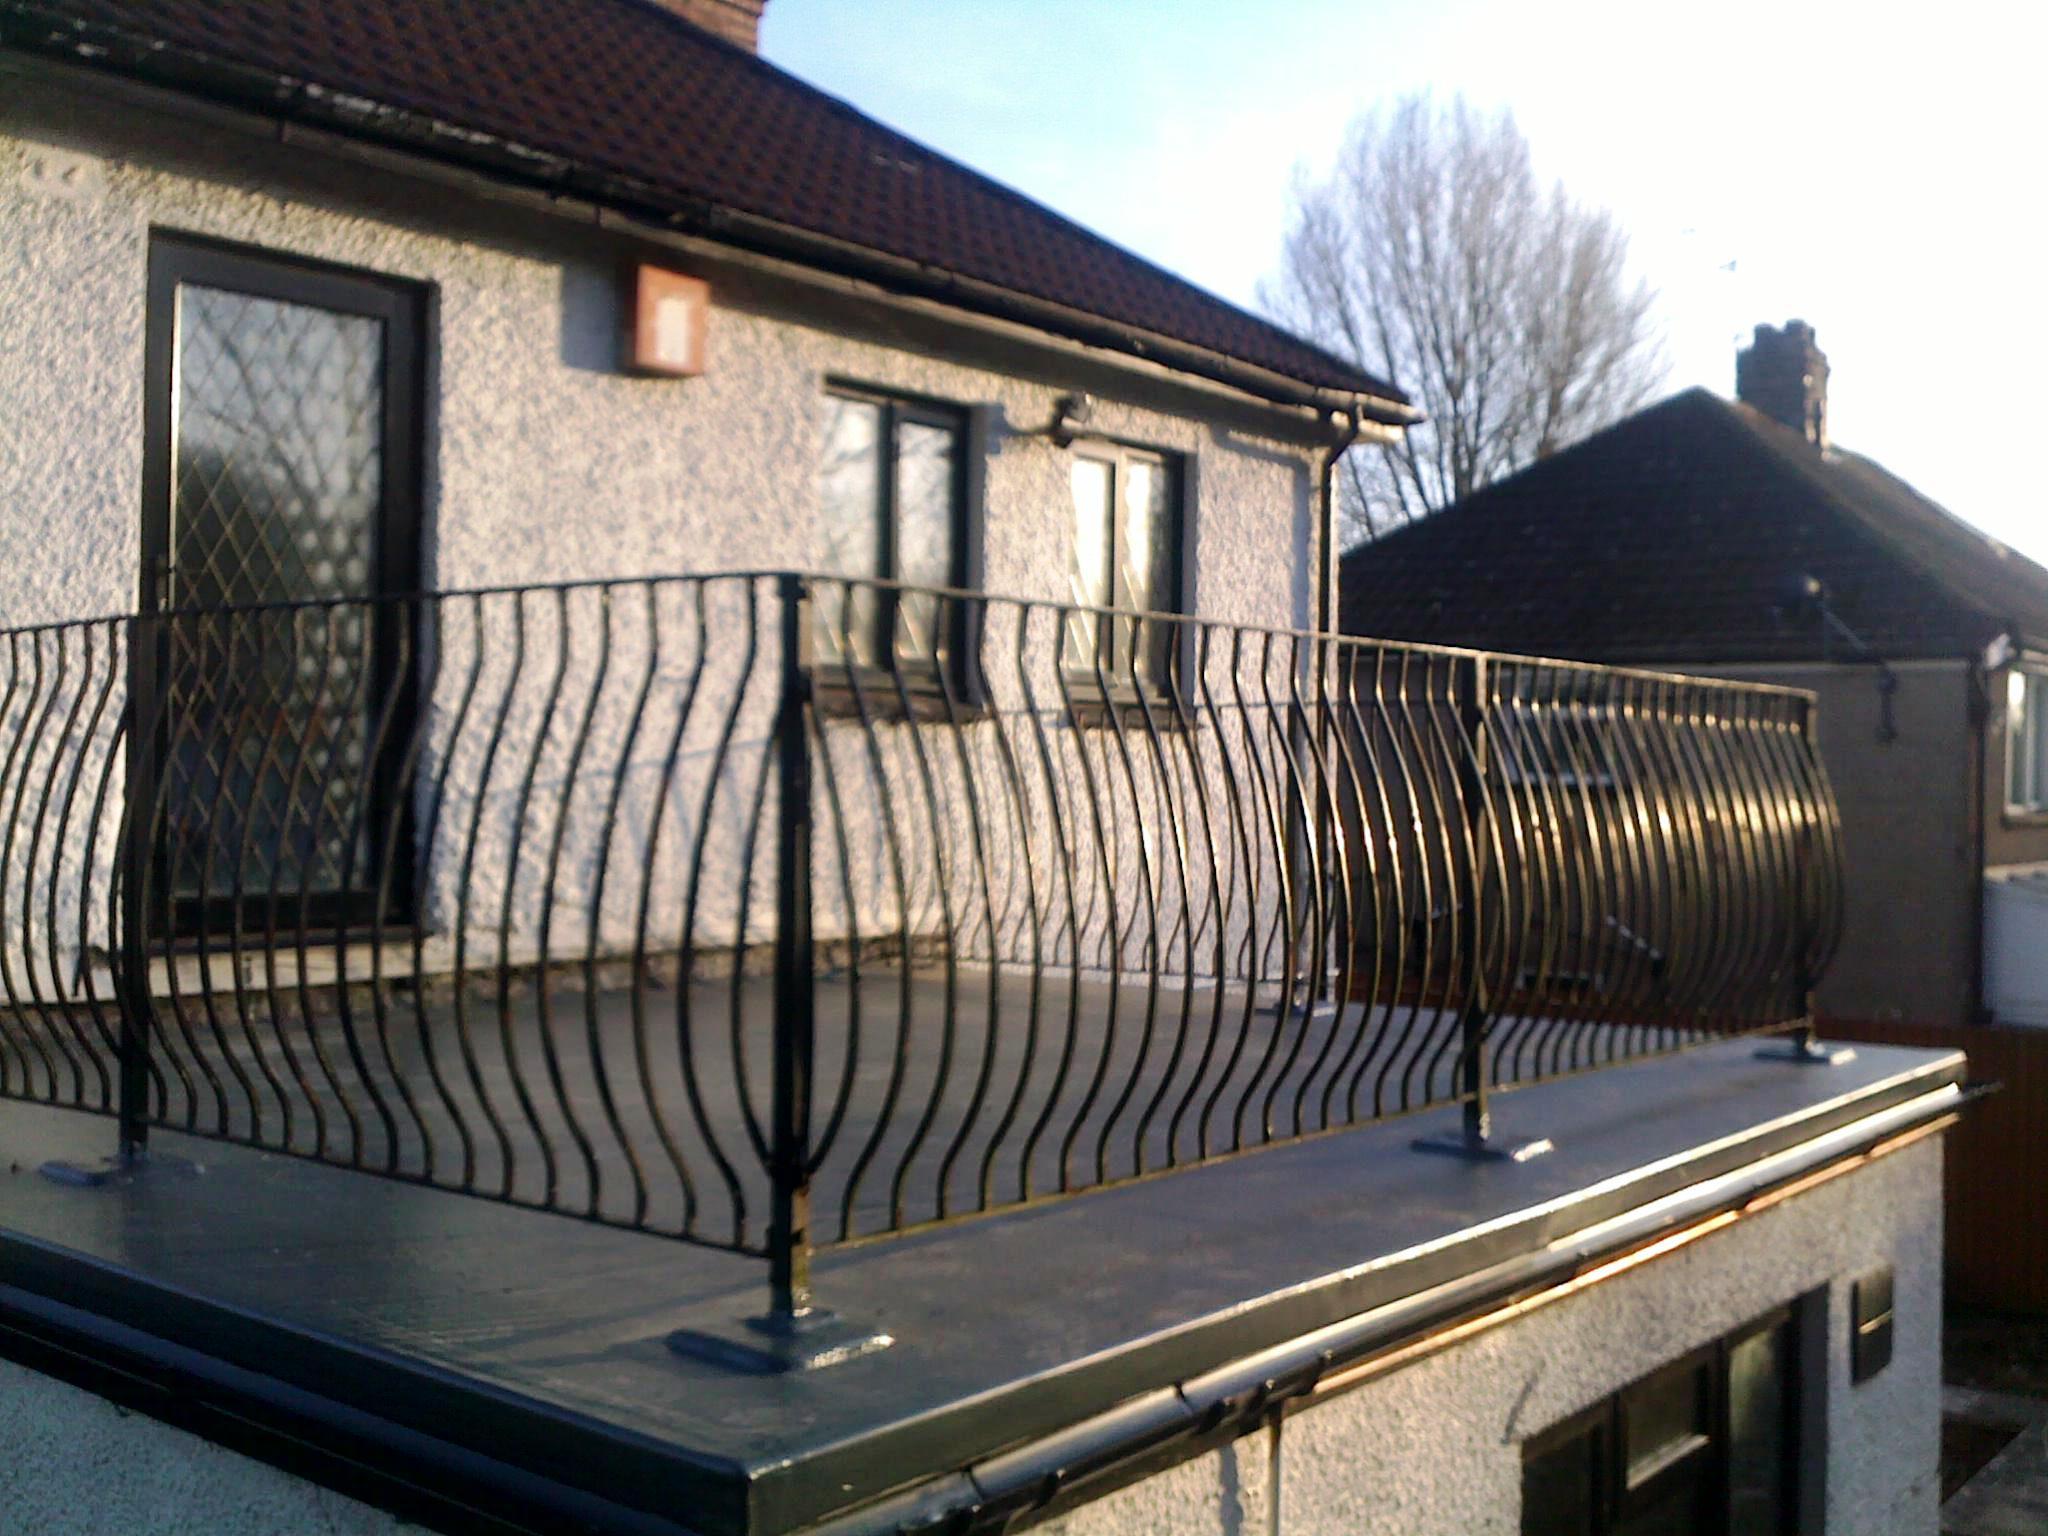 Balcony flat roof with railings Crickhowell